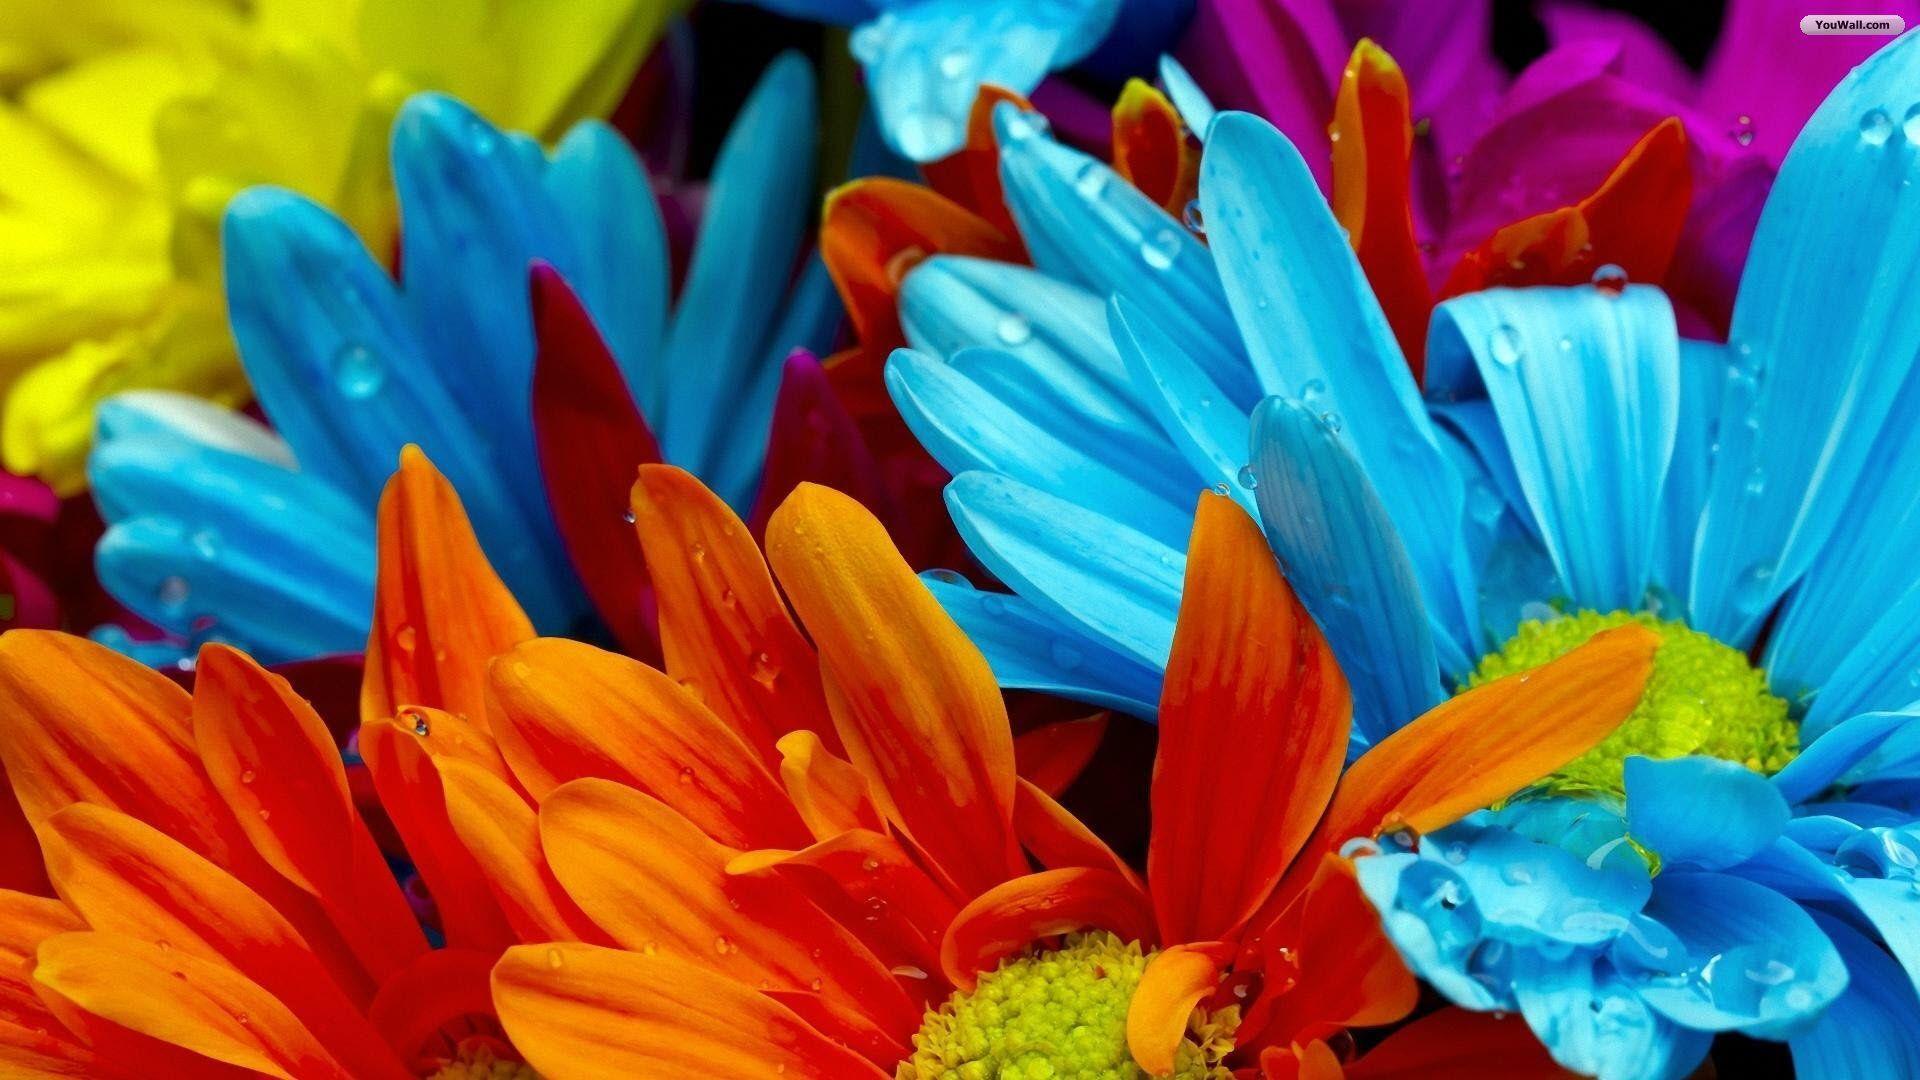 Colorful Summer Desktop Backgrounds: Summer Flowers Wallpapers